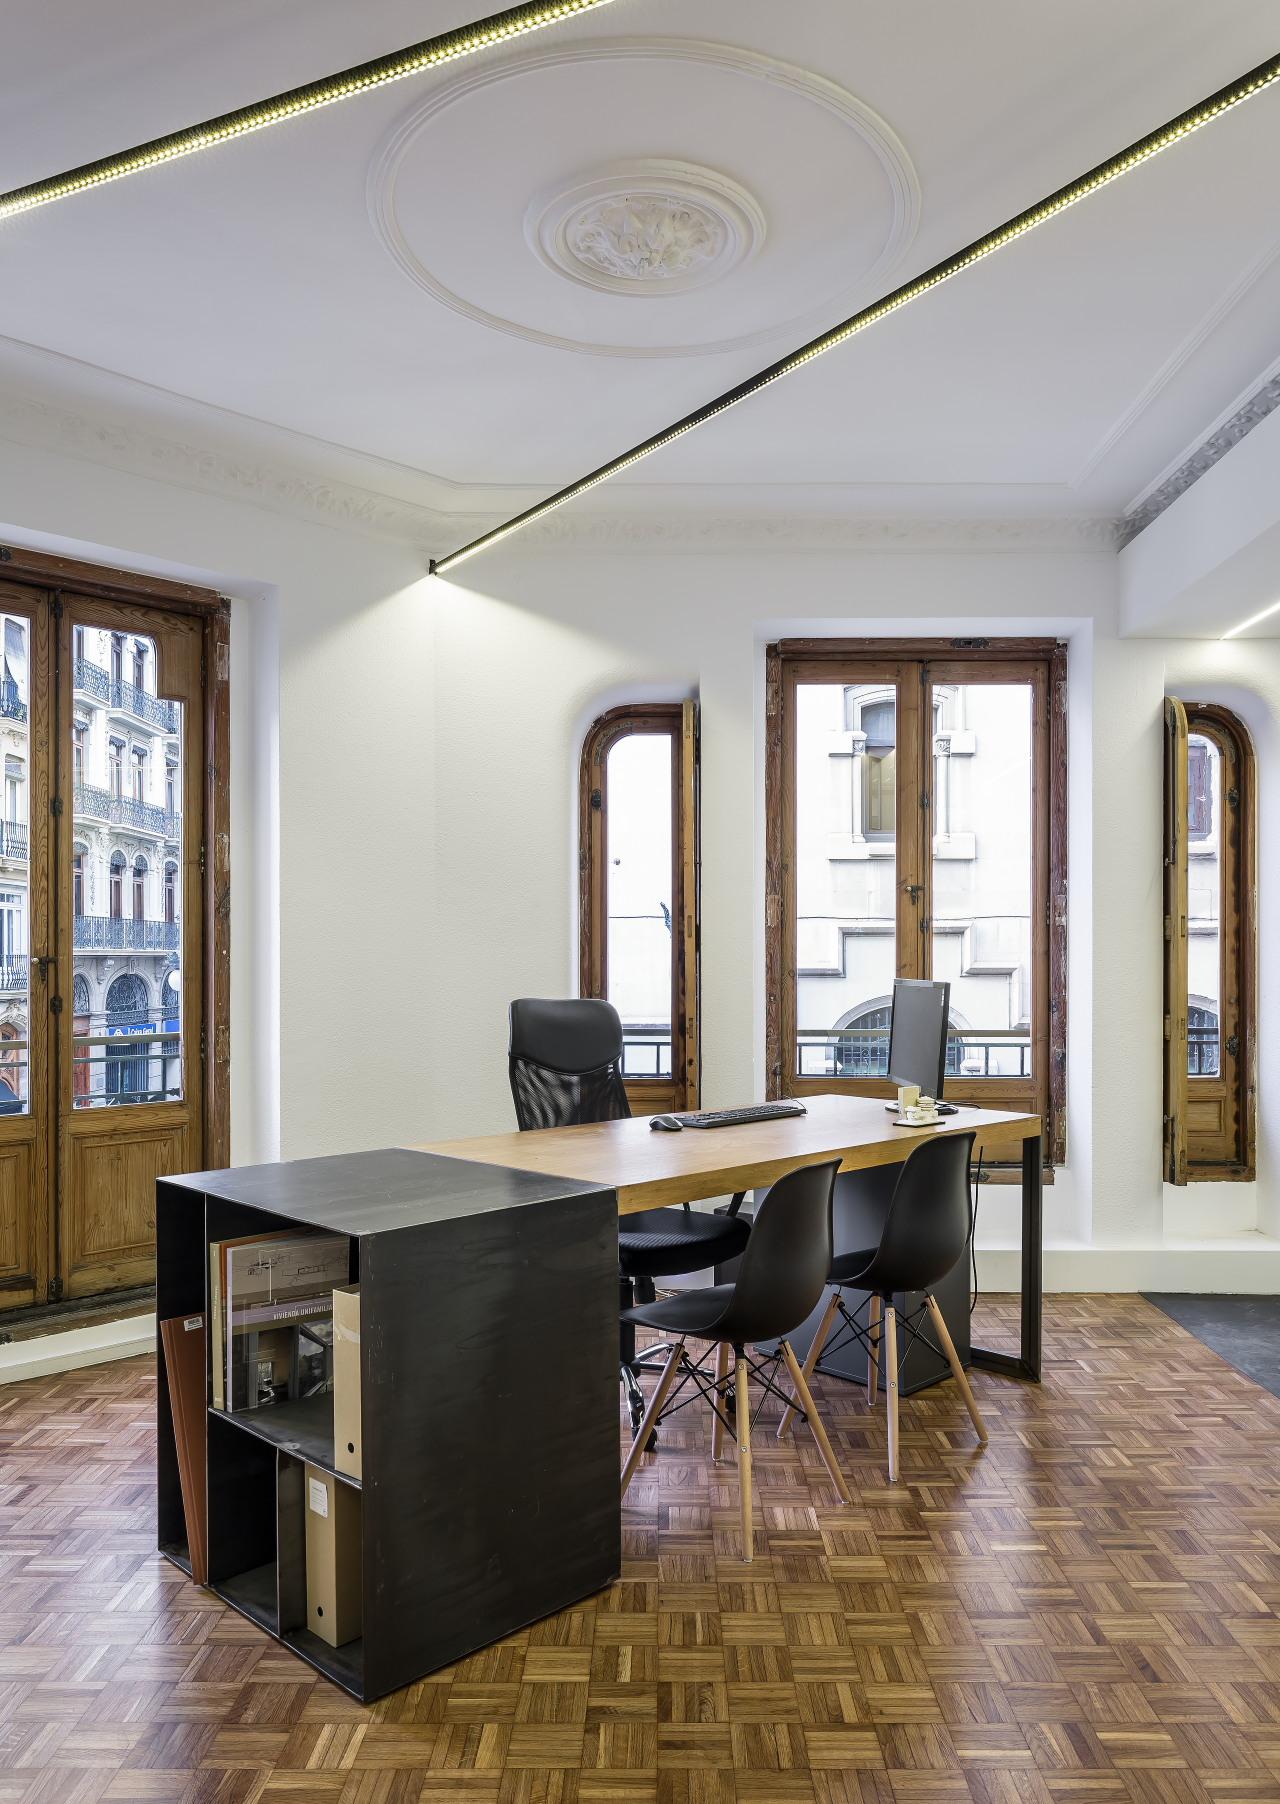 fotografia-arquitectura-interiorismo-valencia-german-cabo-viraje-estudio-pujol (7)